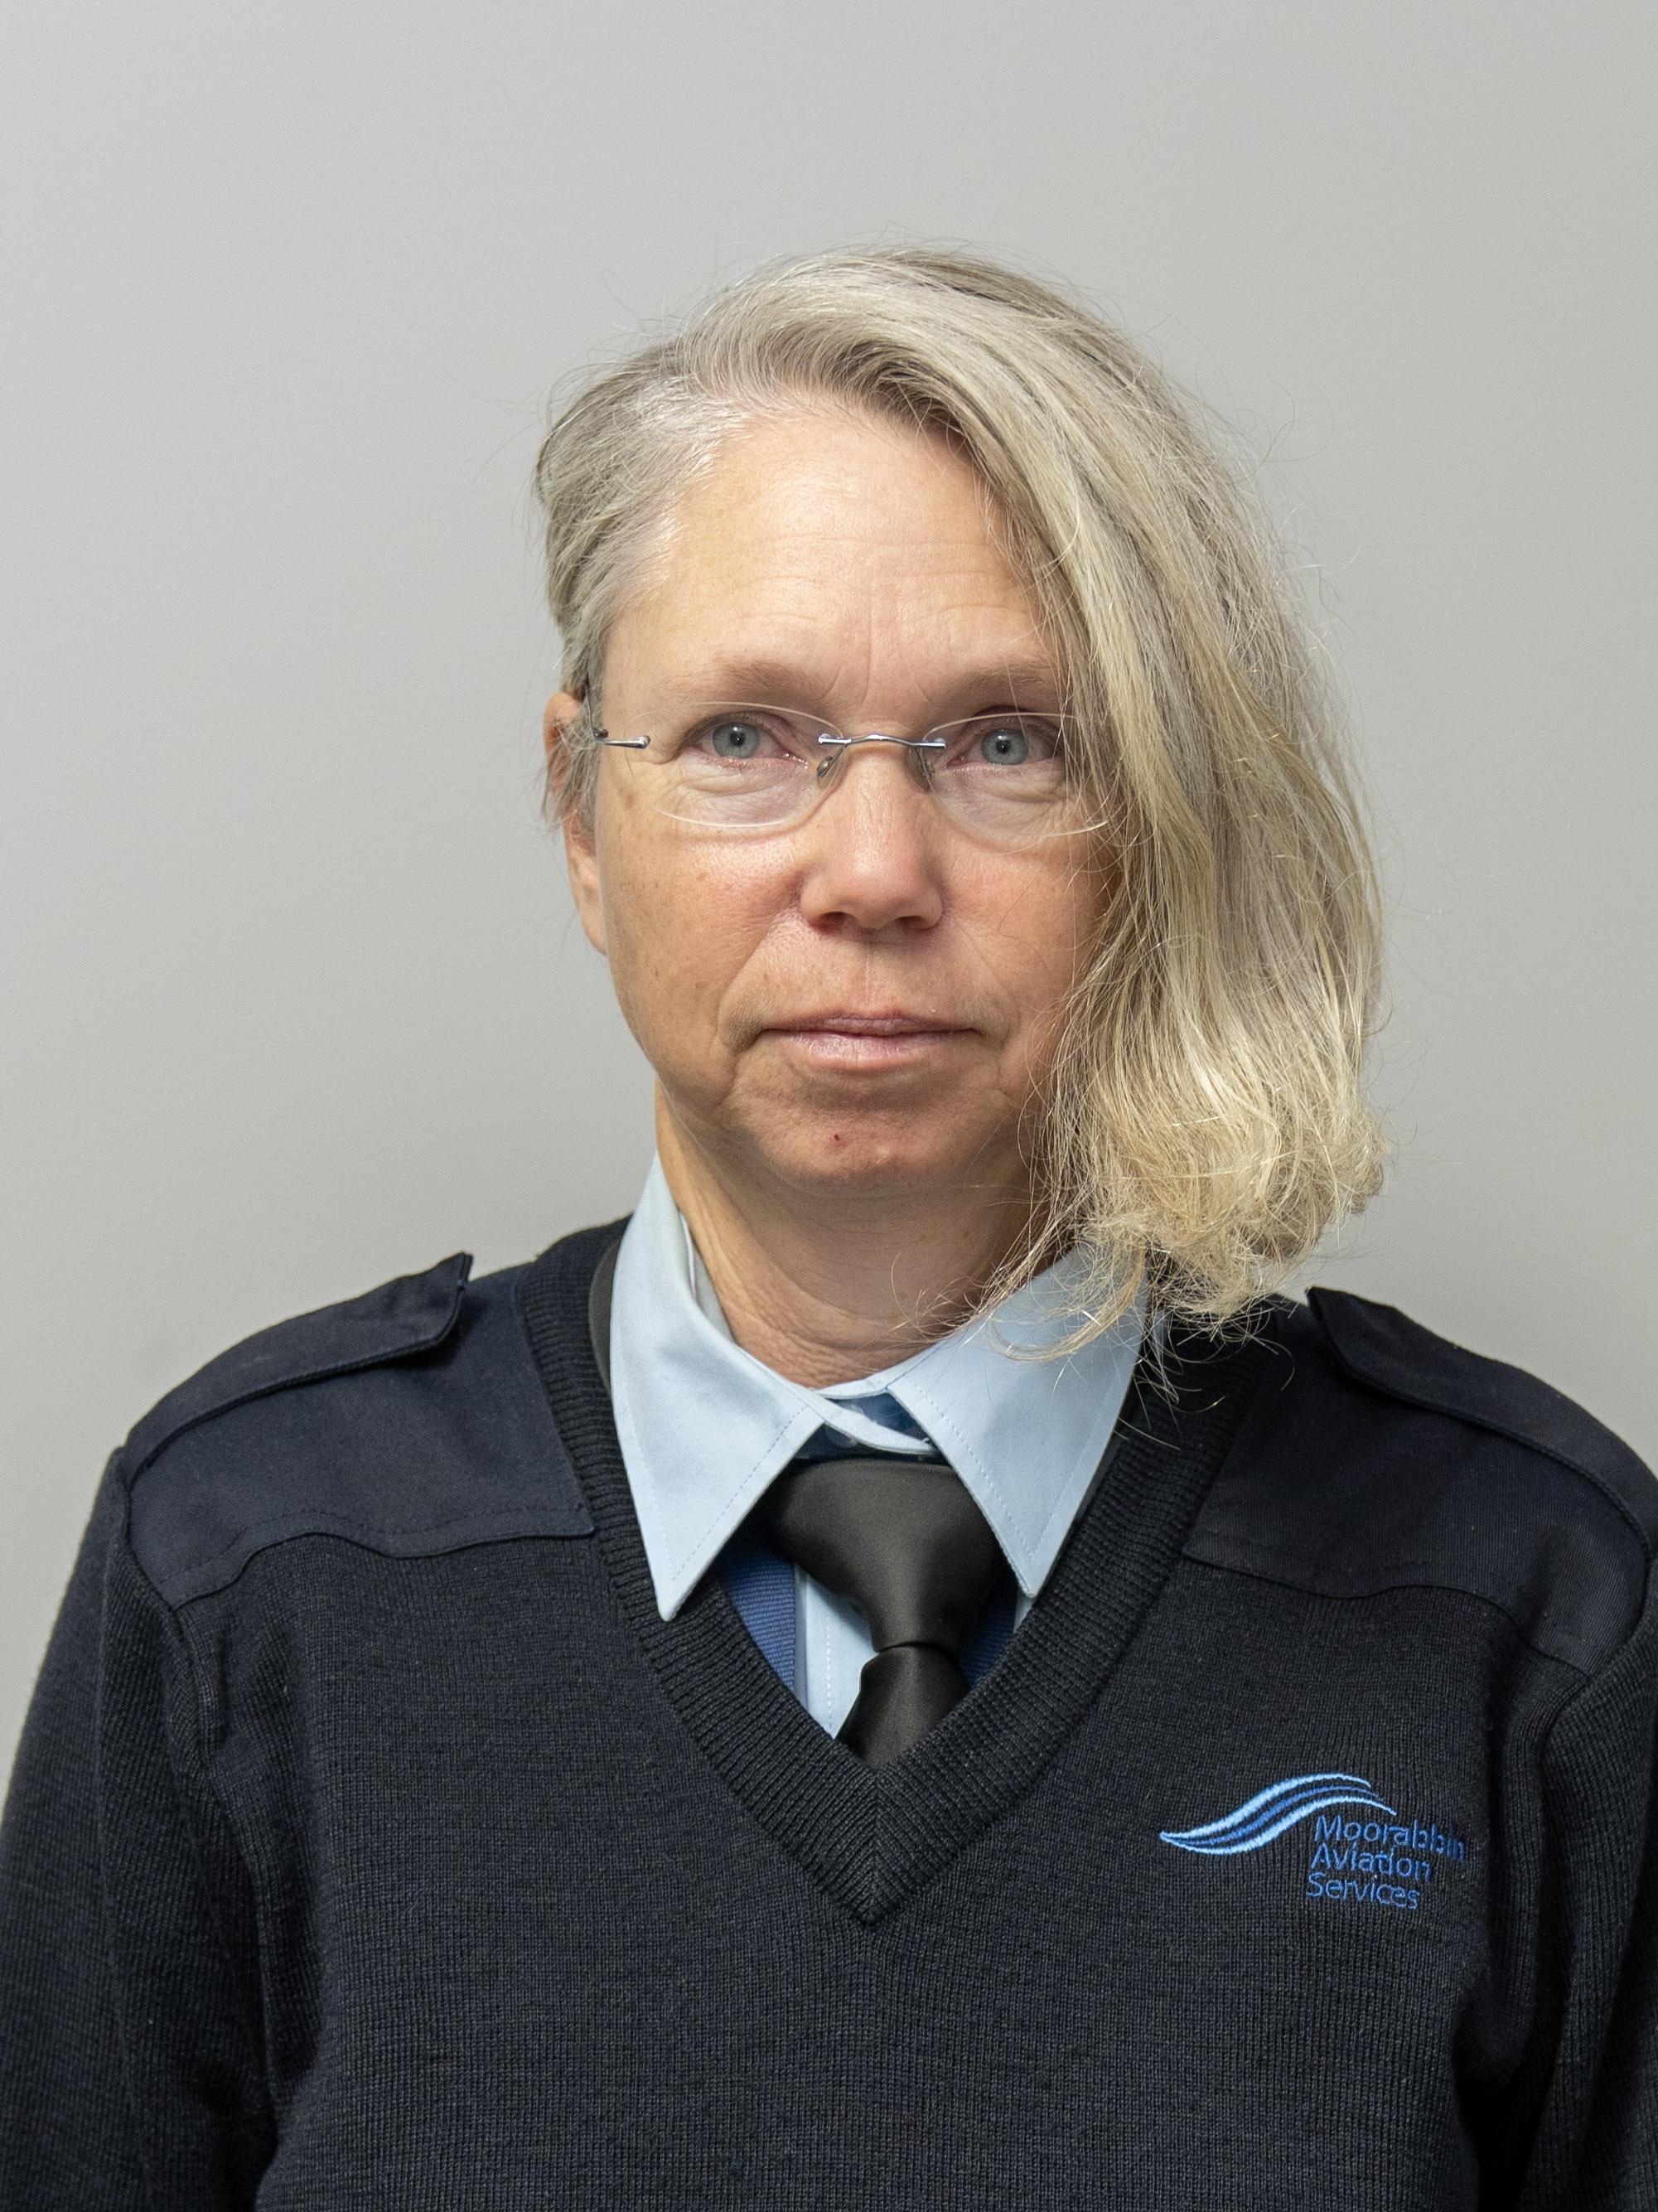 Sonja Fabig